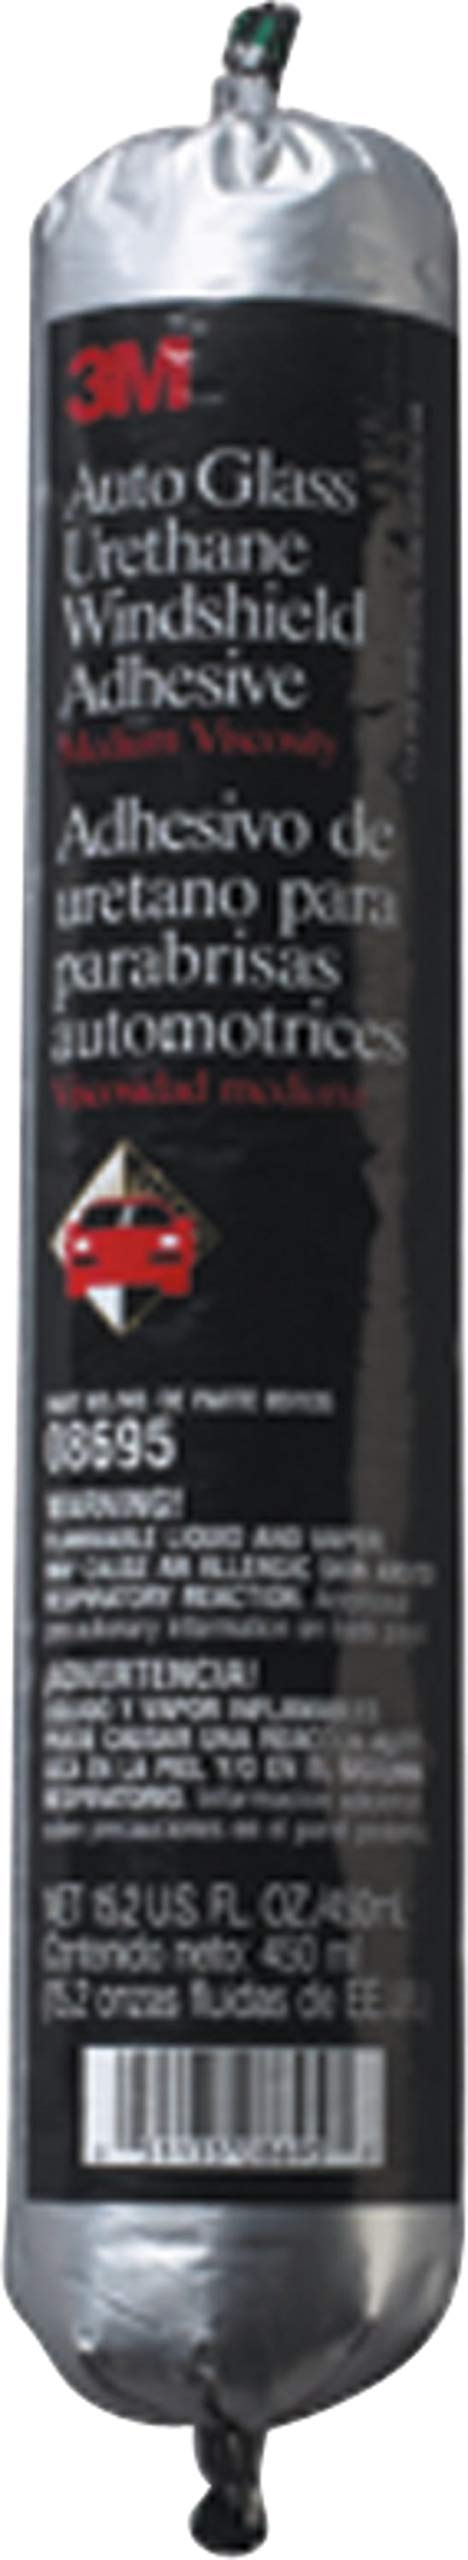 3M Auto Glass Urethane Windshield Adhesive, 08695, 450 mL Flex Pack